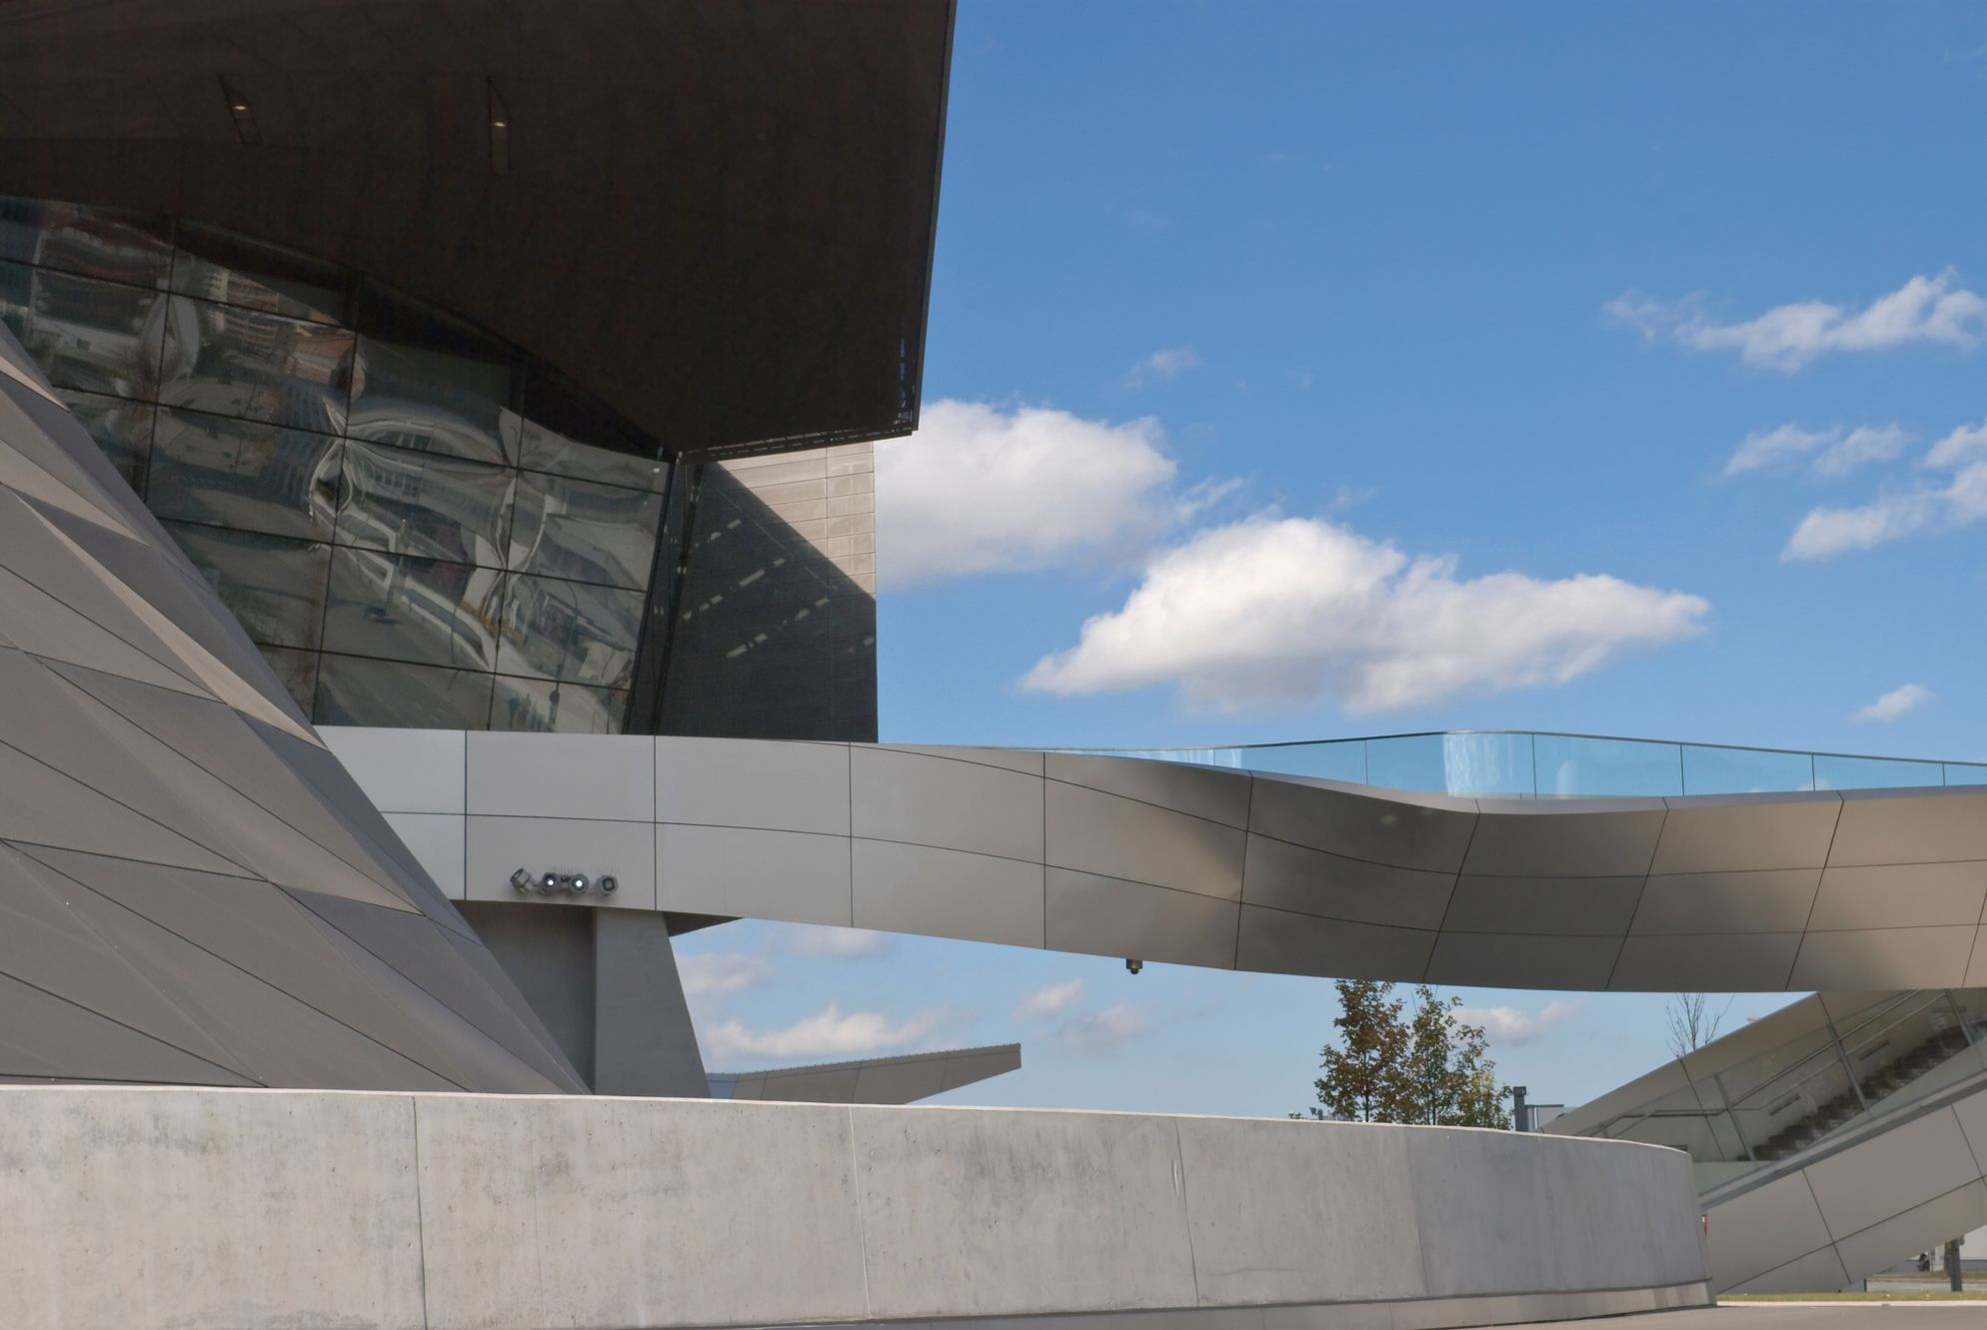 To Μουσείο BMW είναι απ' τα τοπ αξιοθέατα στο Μόναχο